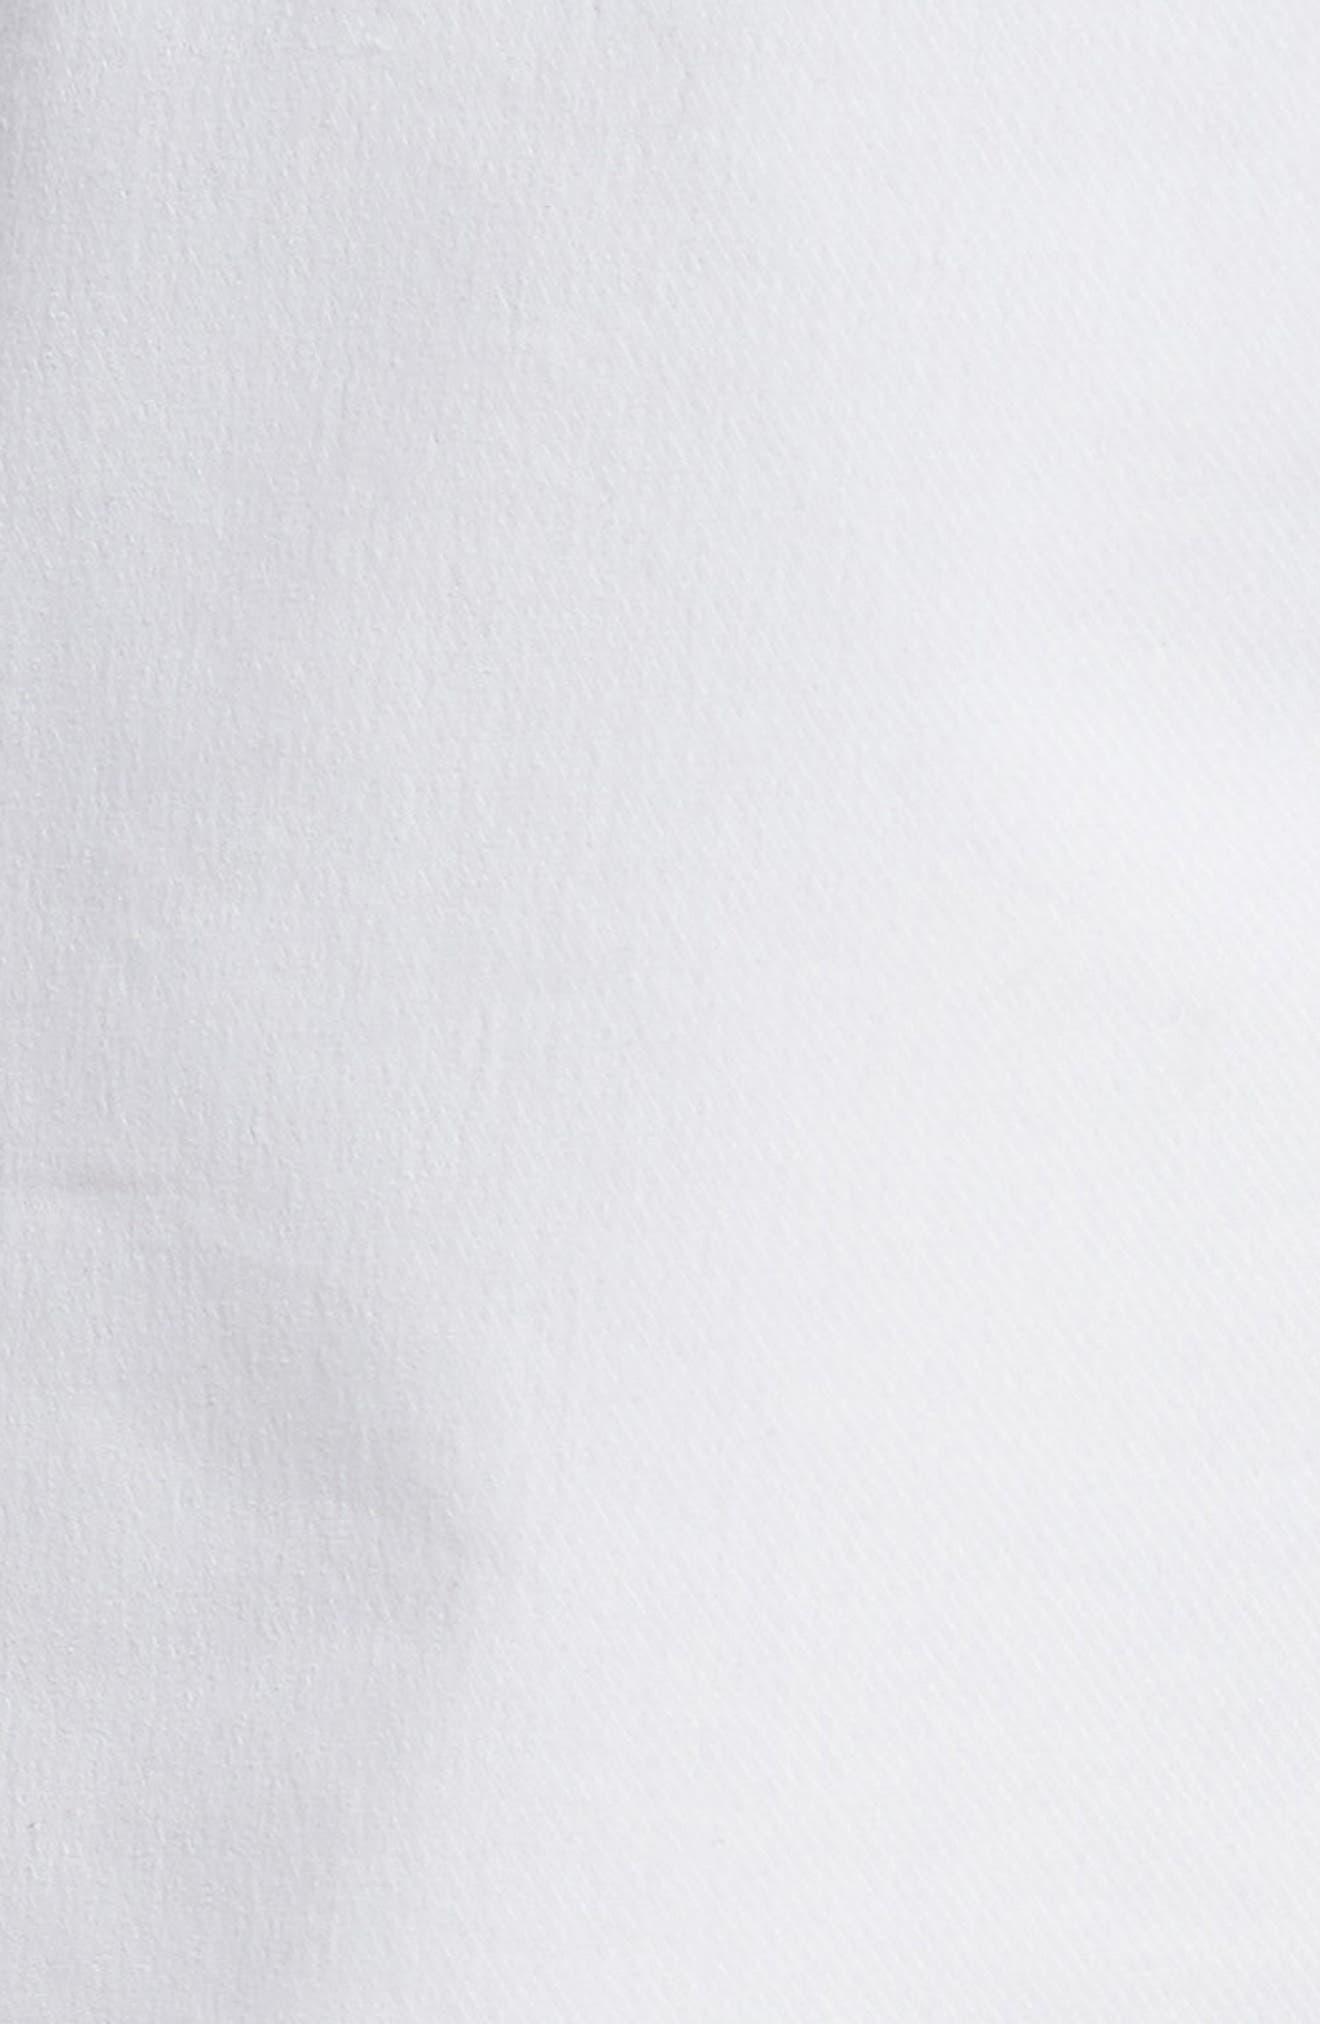 'Hefner' Stretch Golf Shorts,                             Alternate thumbnail 5, color,                             MICRO CHIP